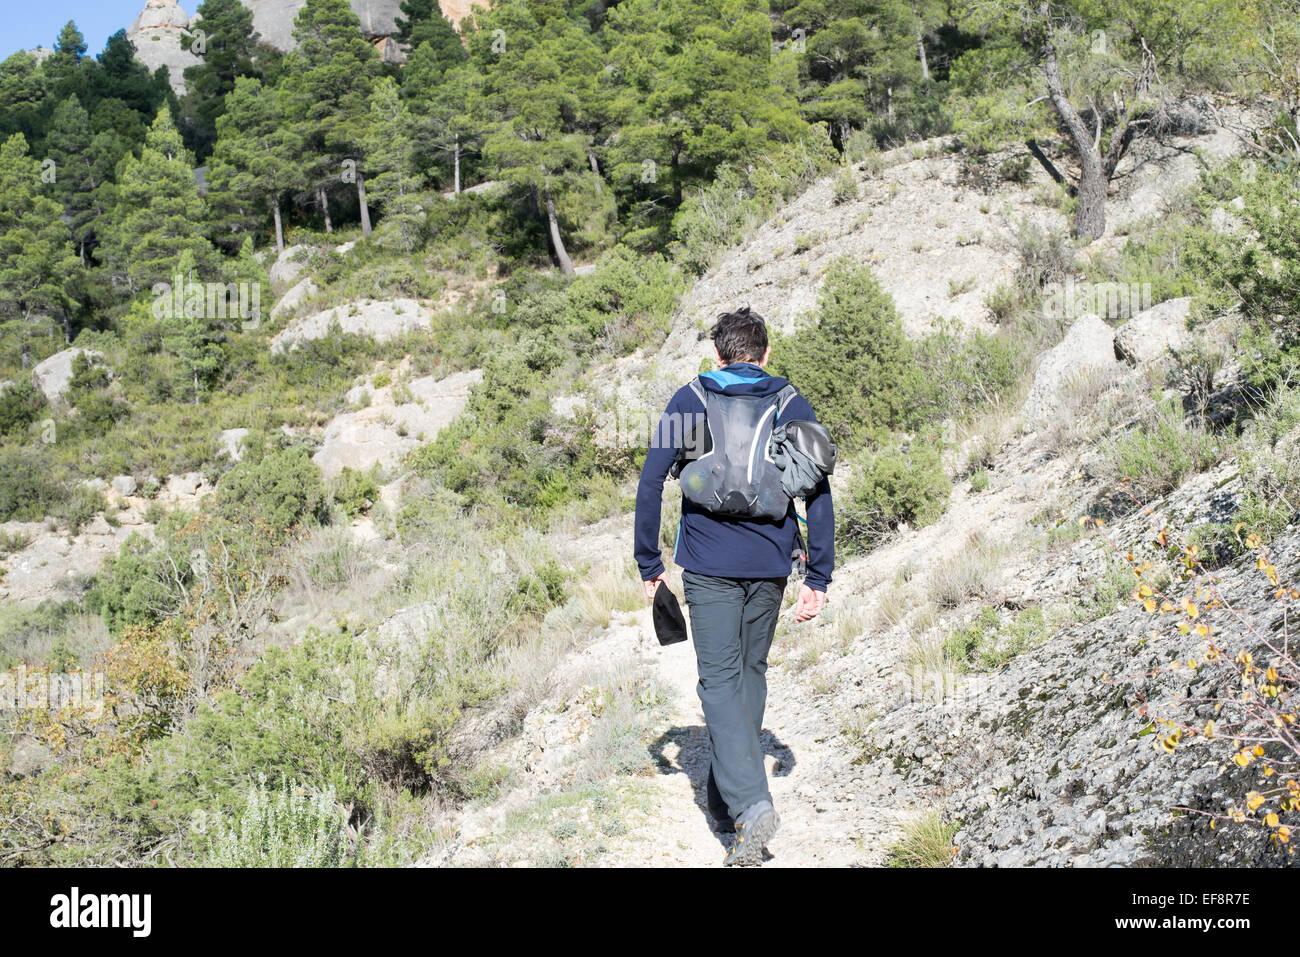 Spain, Catalonia, Tarragona, Montsant, Serra de Montsant, Ulldemolins, Hiker walking away along mountain trail - Stock Image